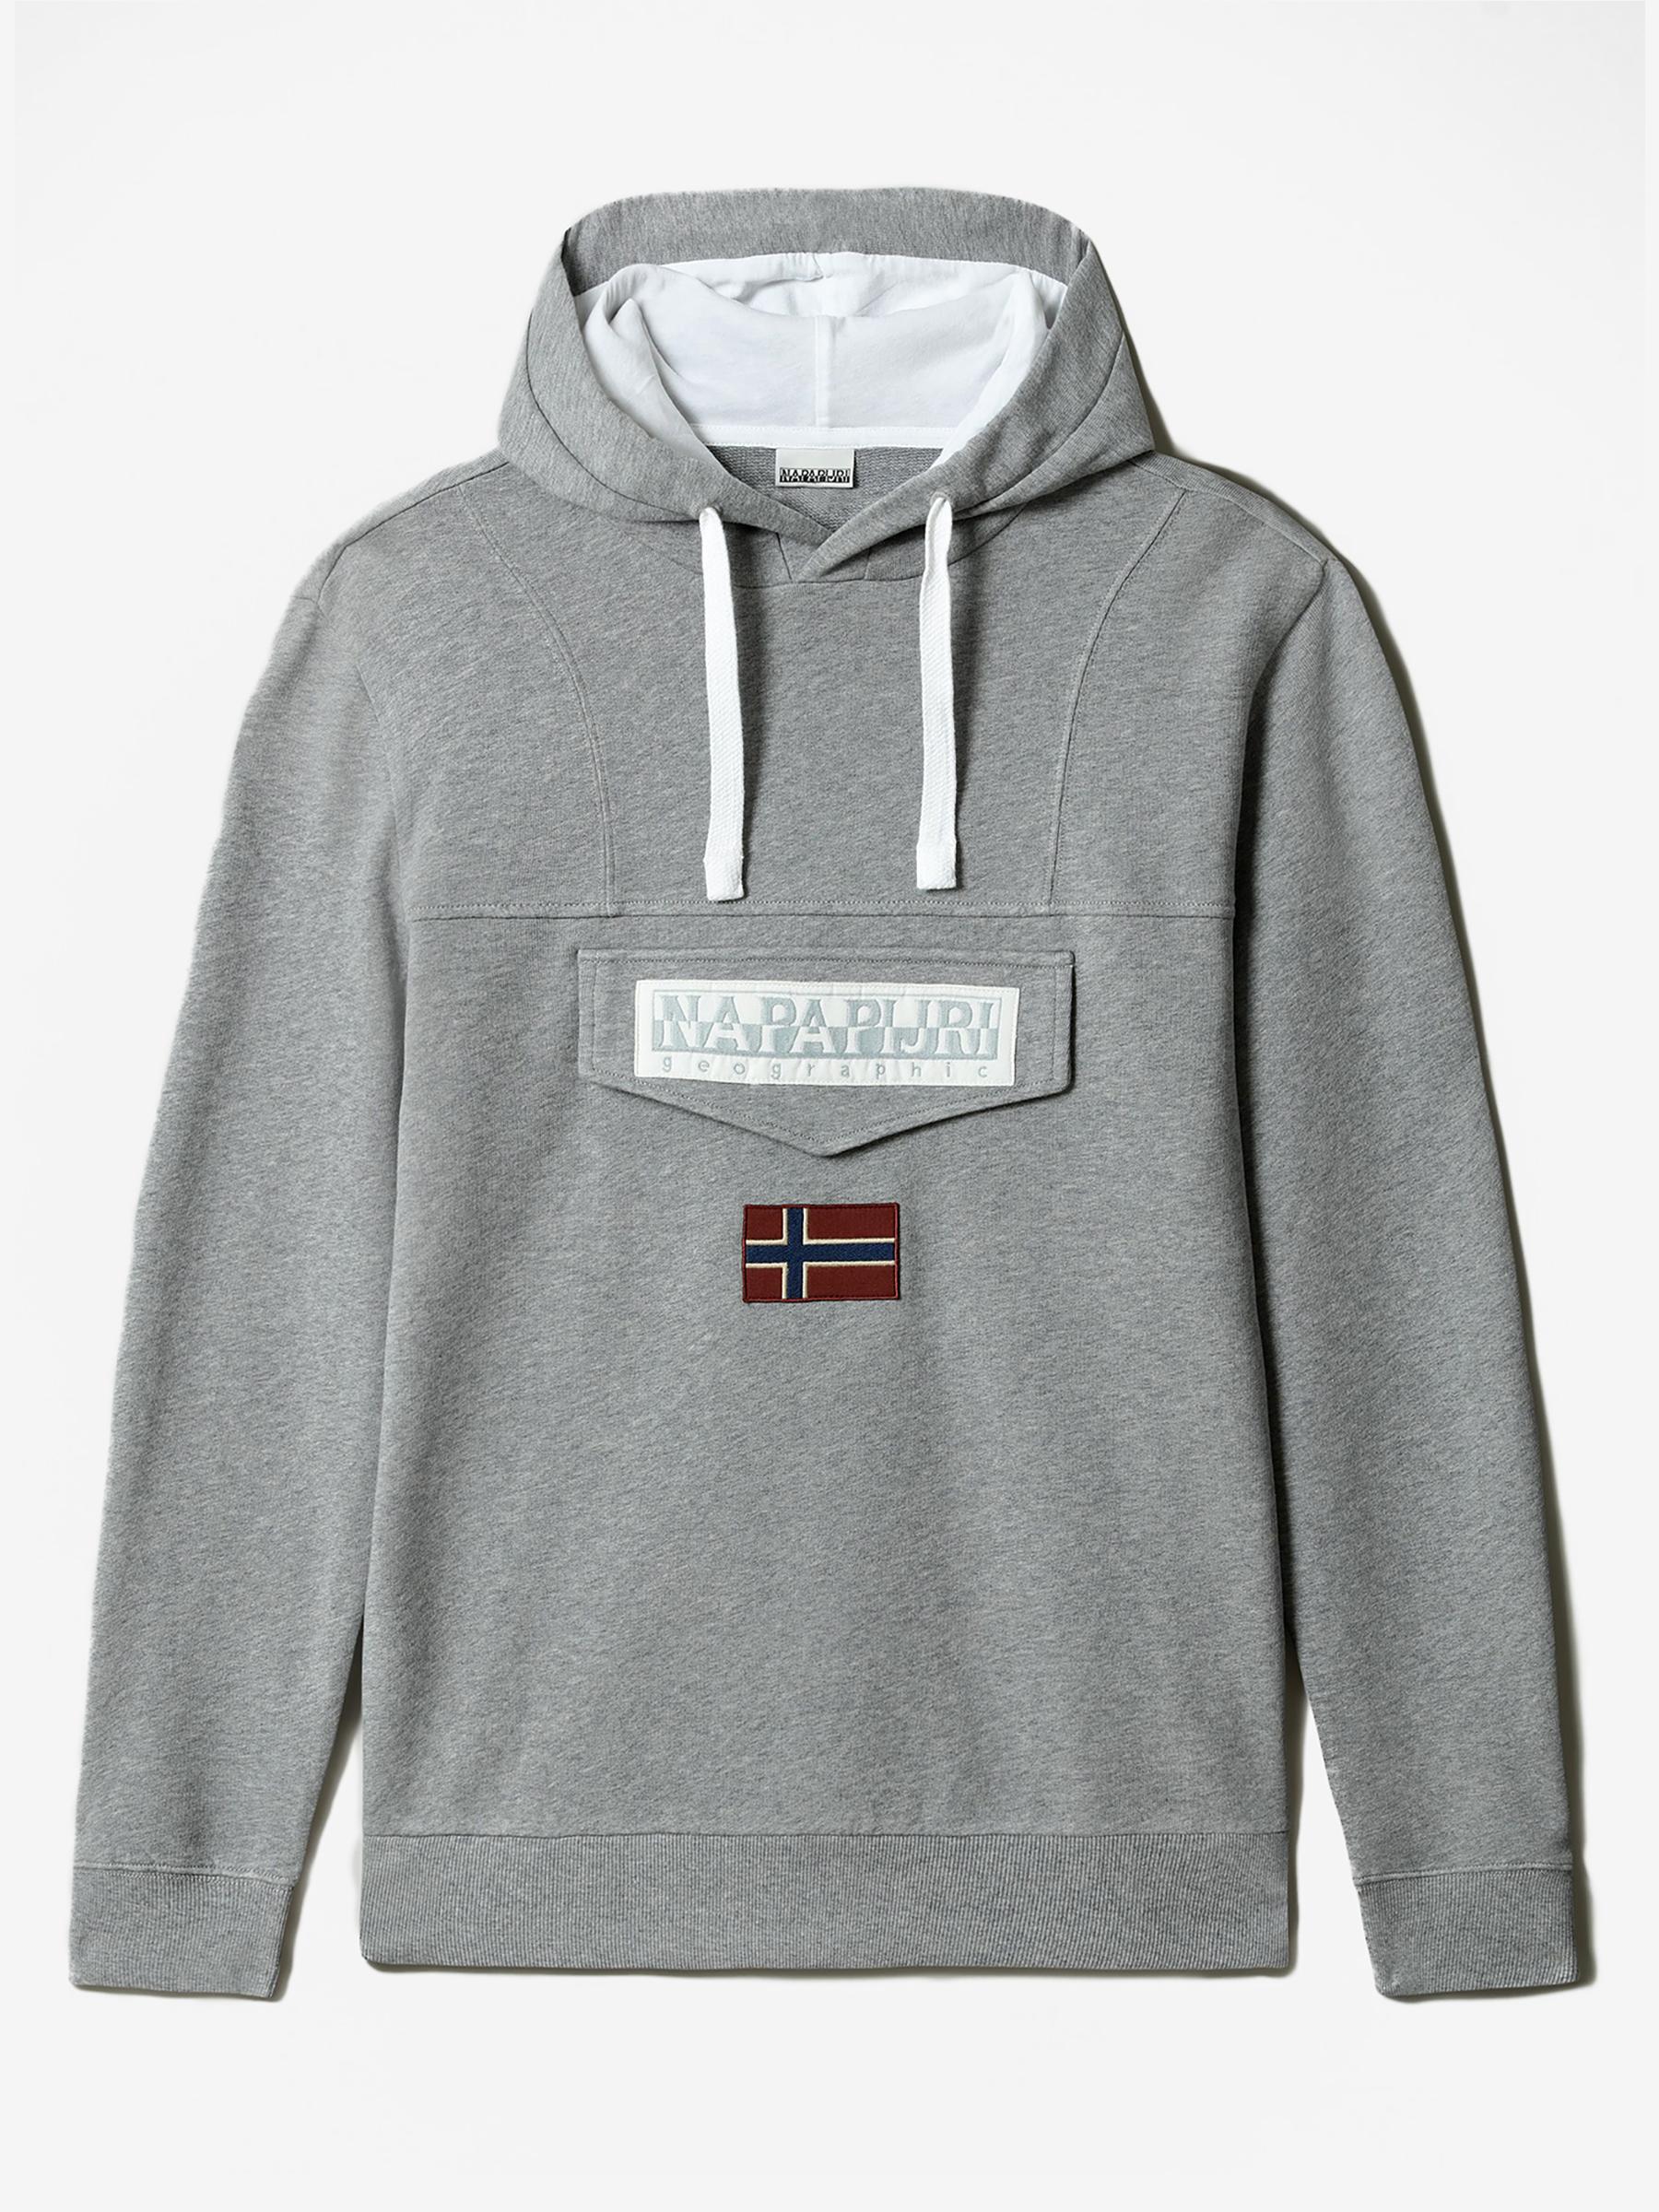 NAPAPIJRI Pánske svetre a mikiny Burgee - XL